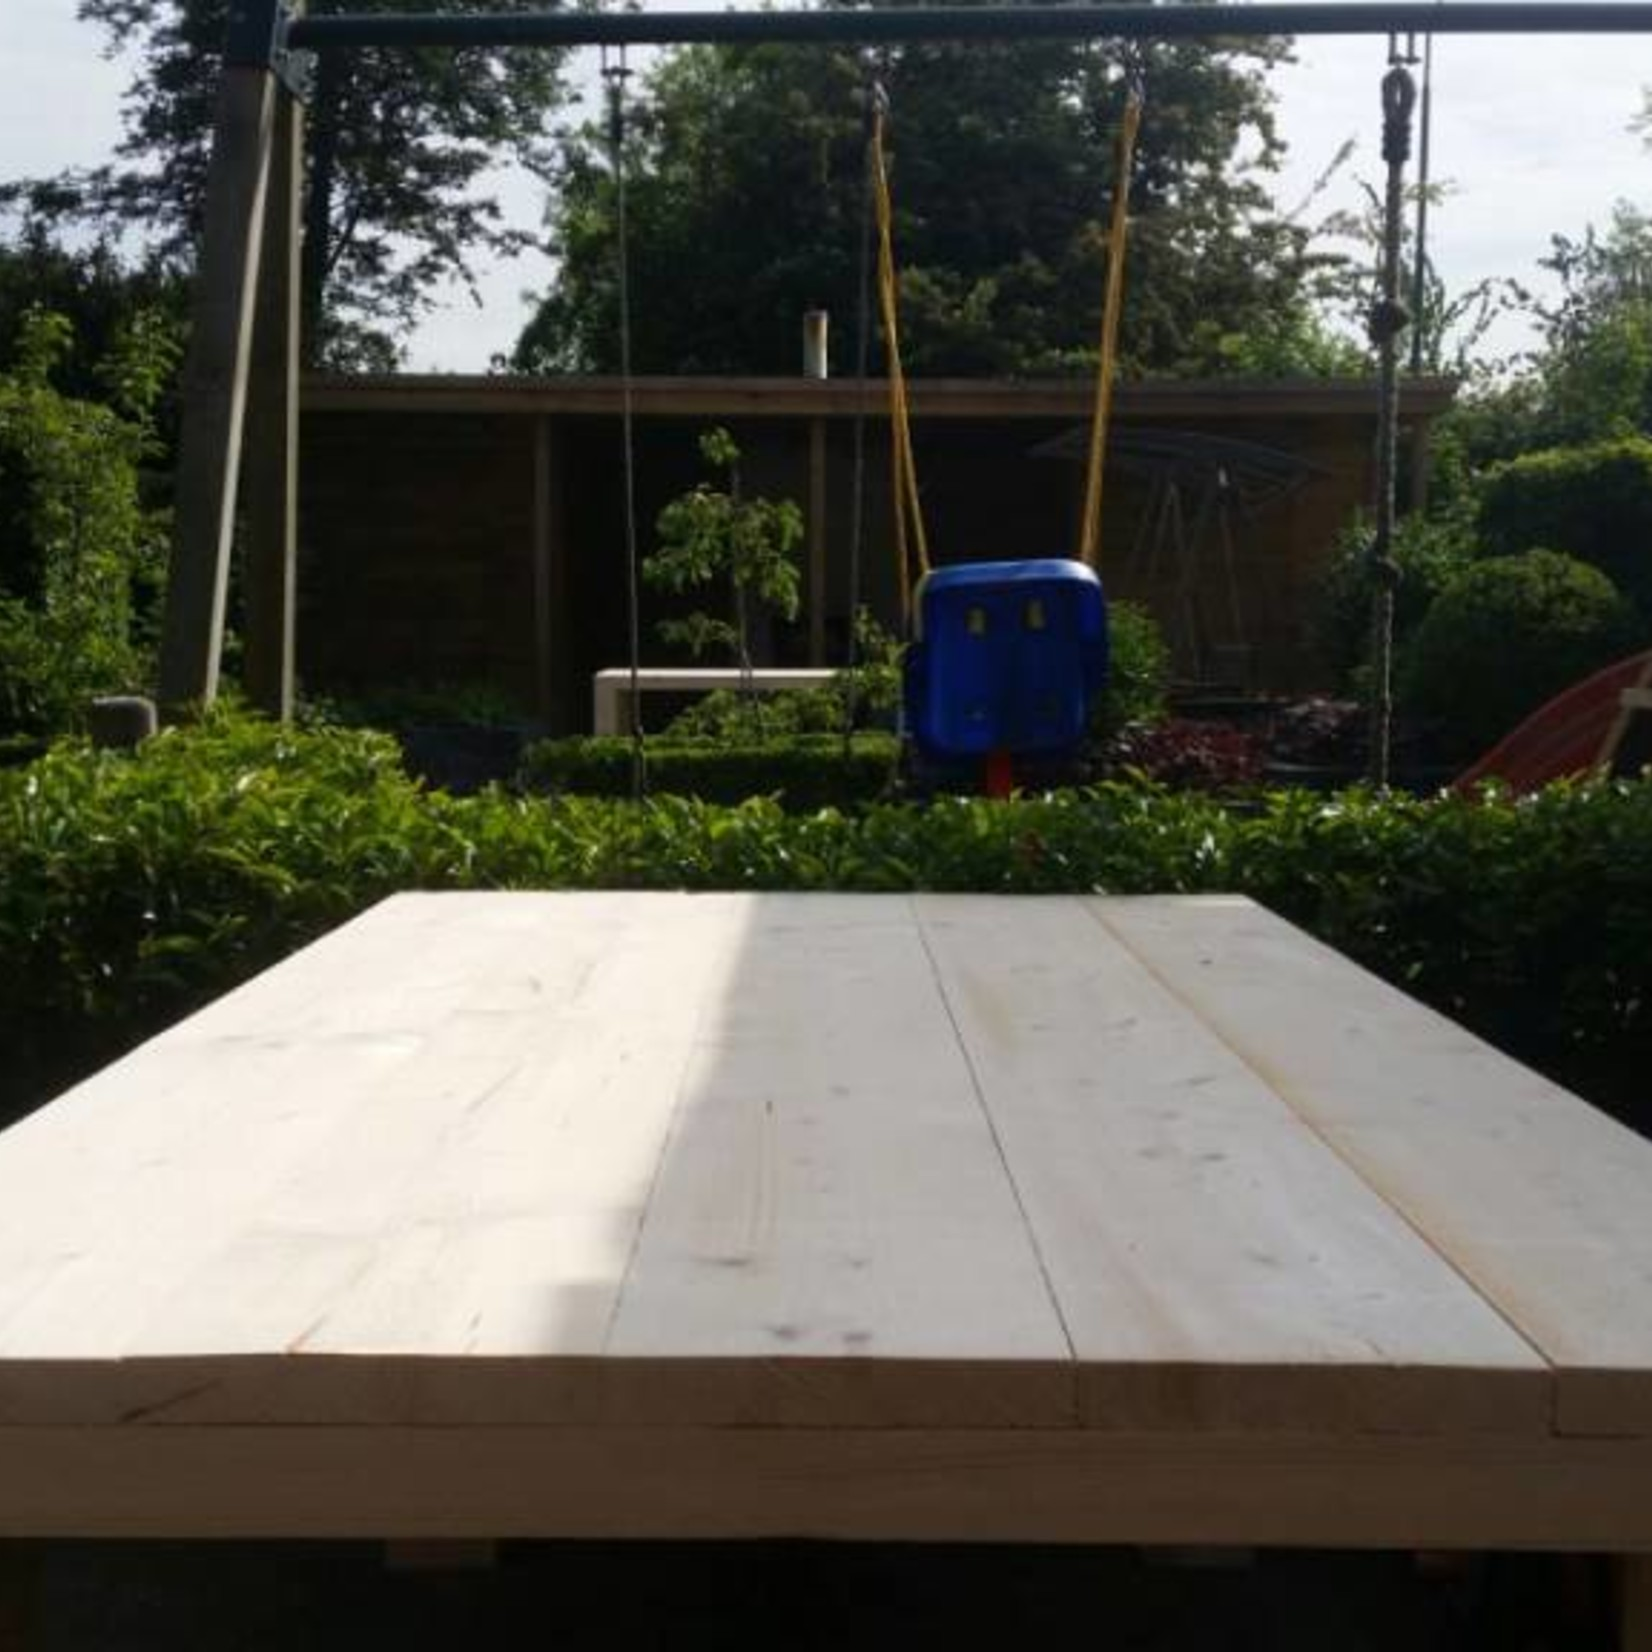 Tuintafel 90 cm breed tot 300 cm lang, Rechte poten - Steigerhout